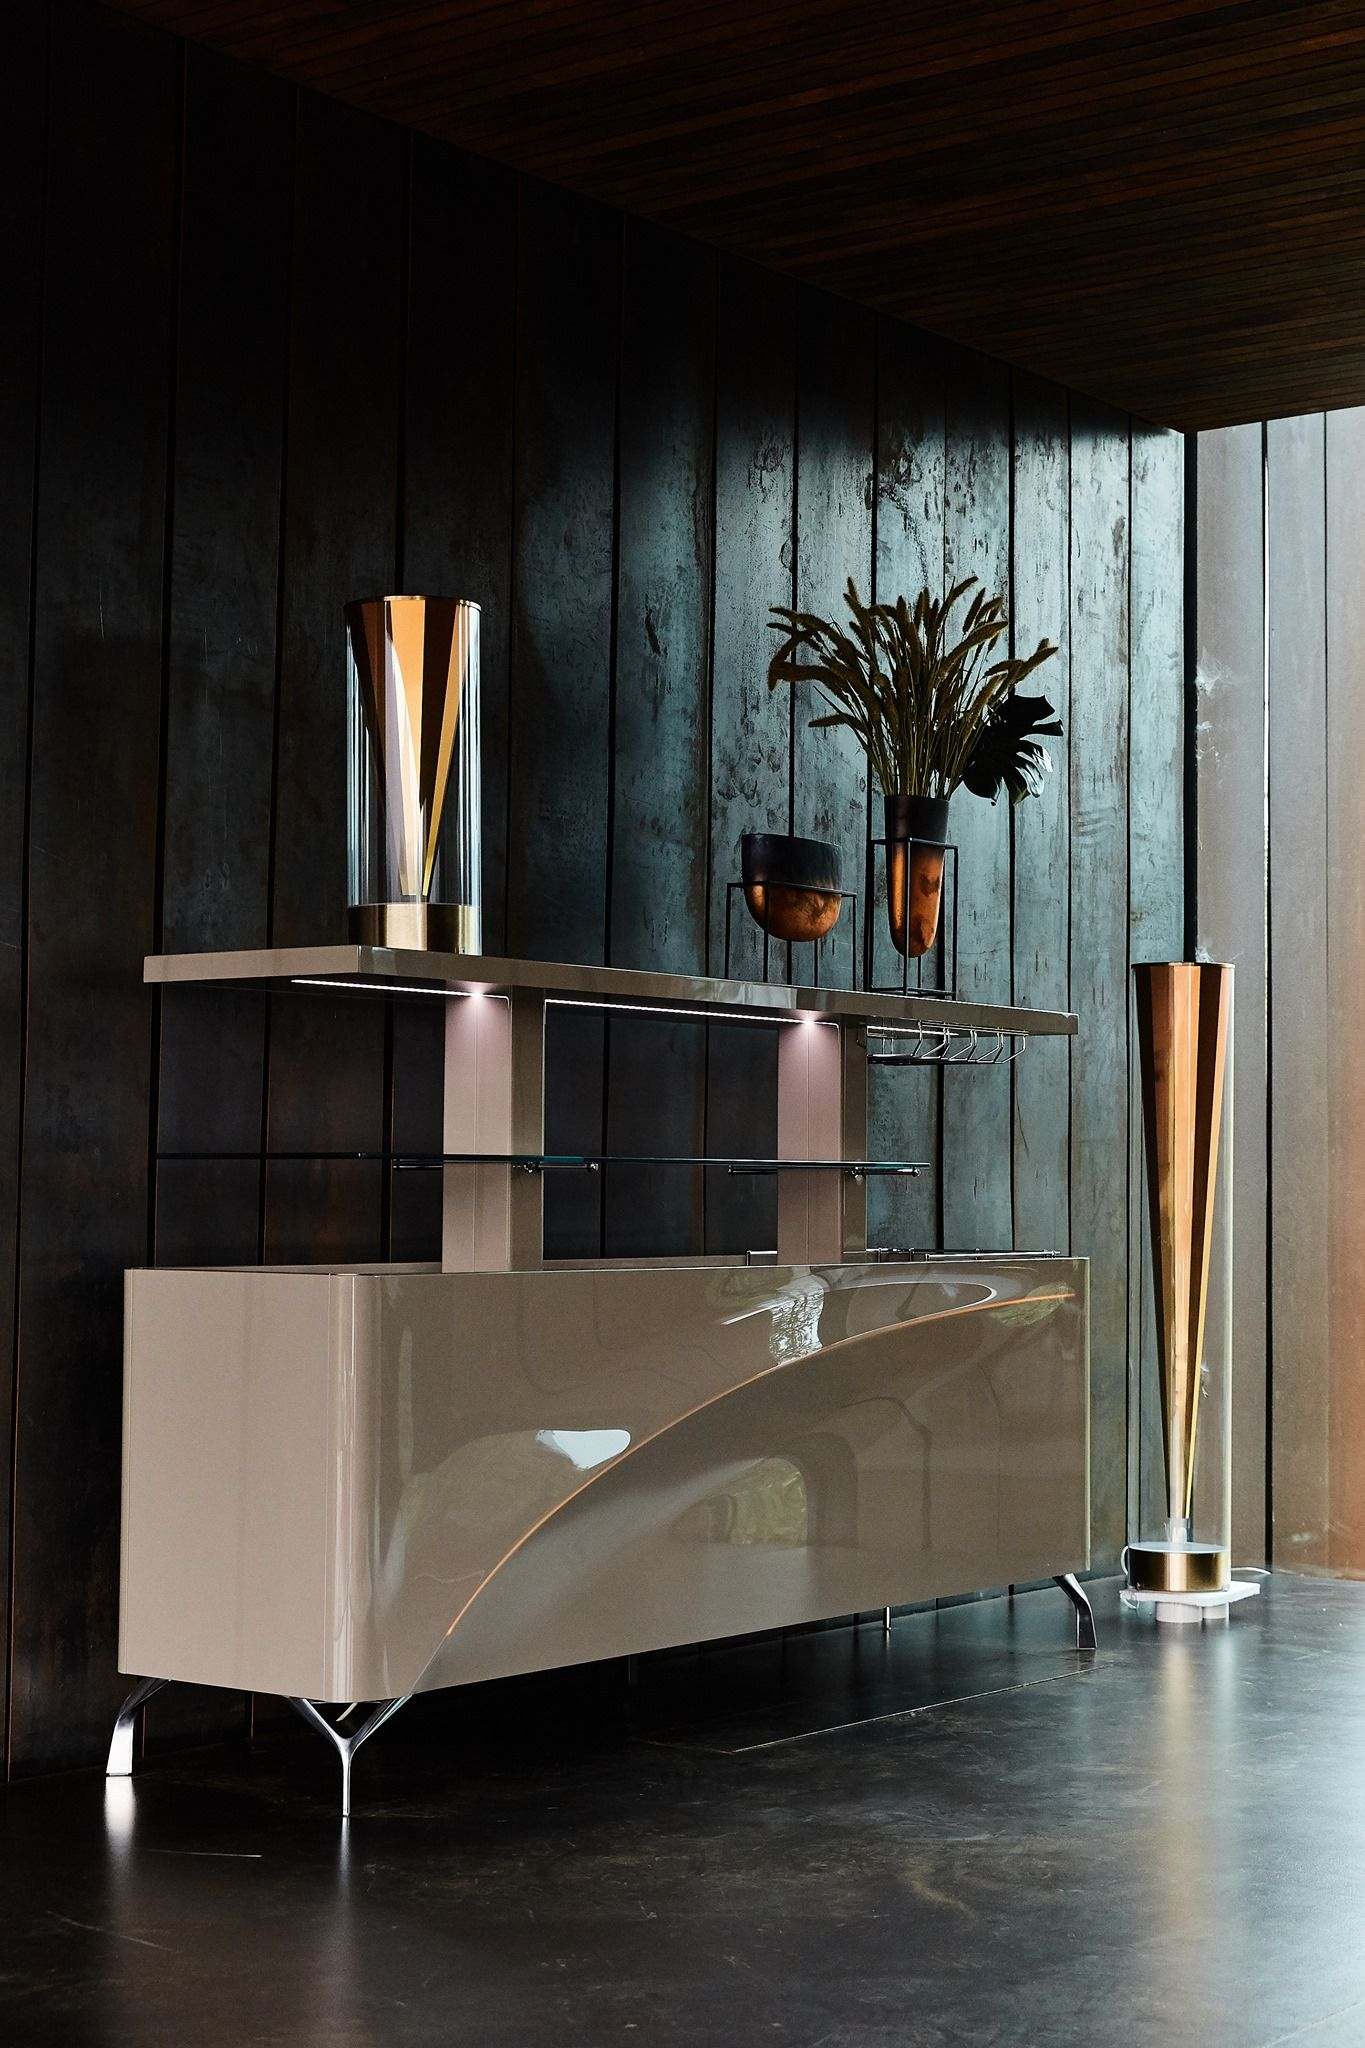 Italian Luxury Furniture Designer Furniture Singapore Da Vinci Lifestyle Contemporary Furniture Design Luxury Furniture Brands Luxury Design